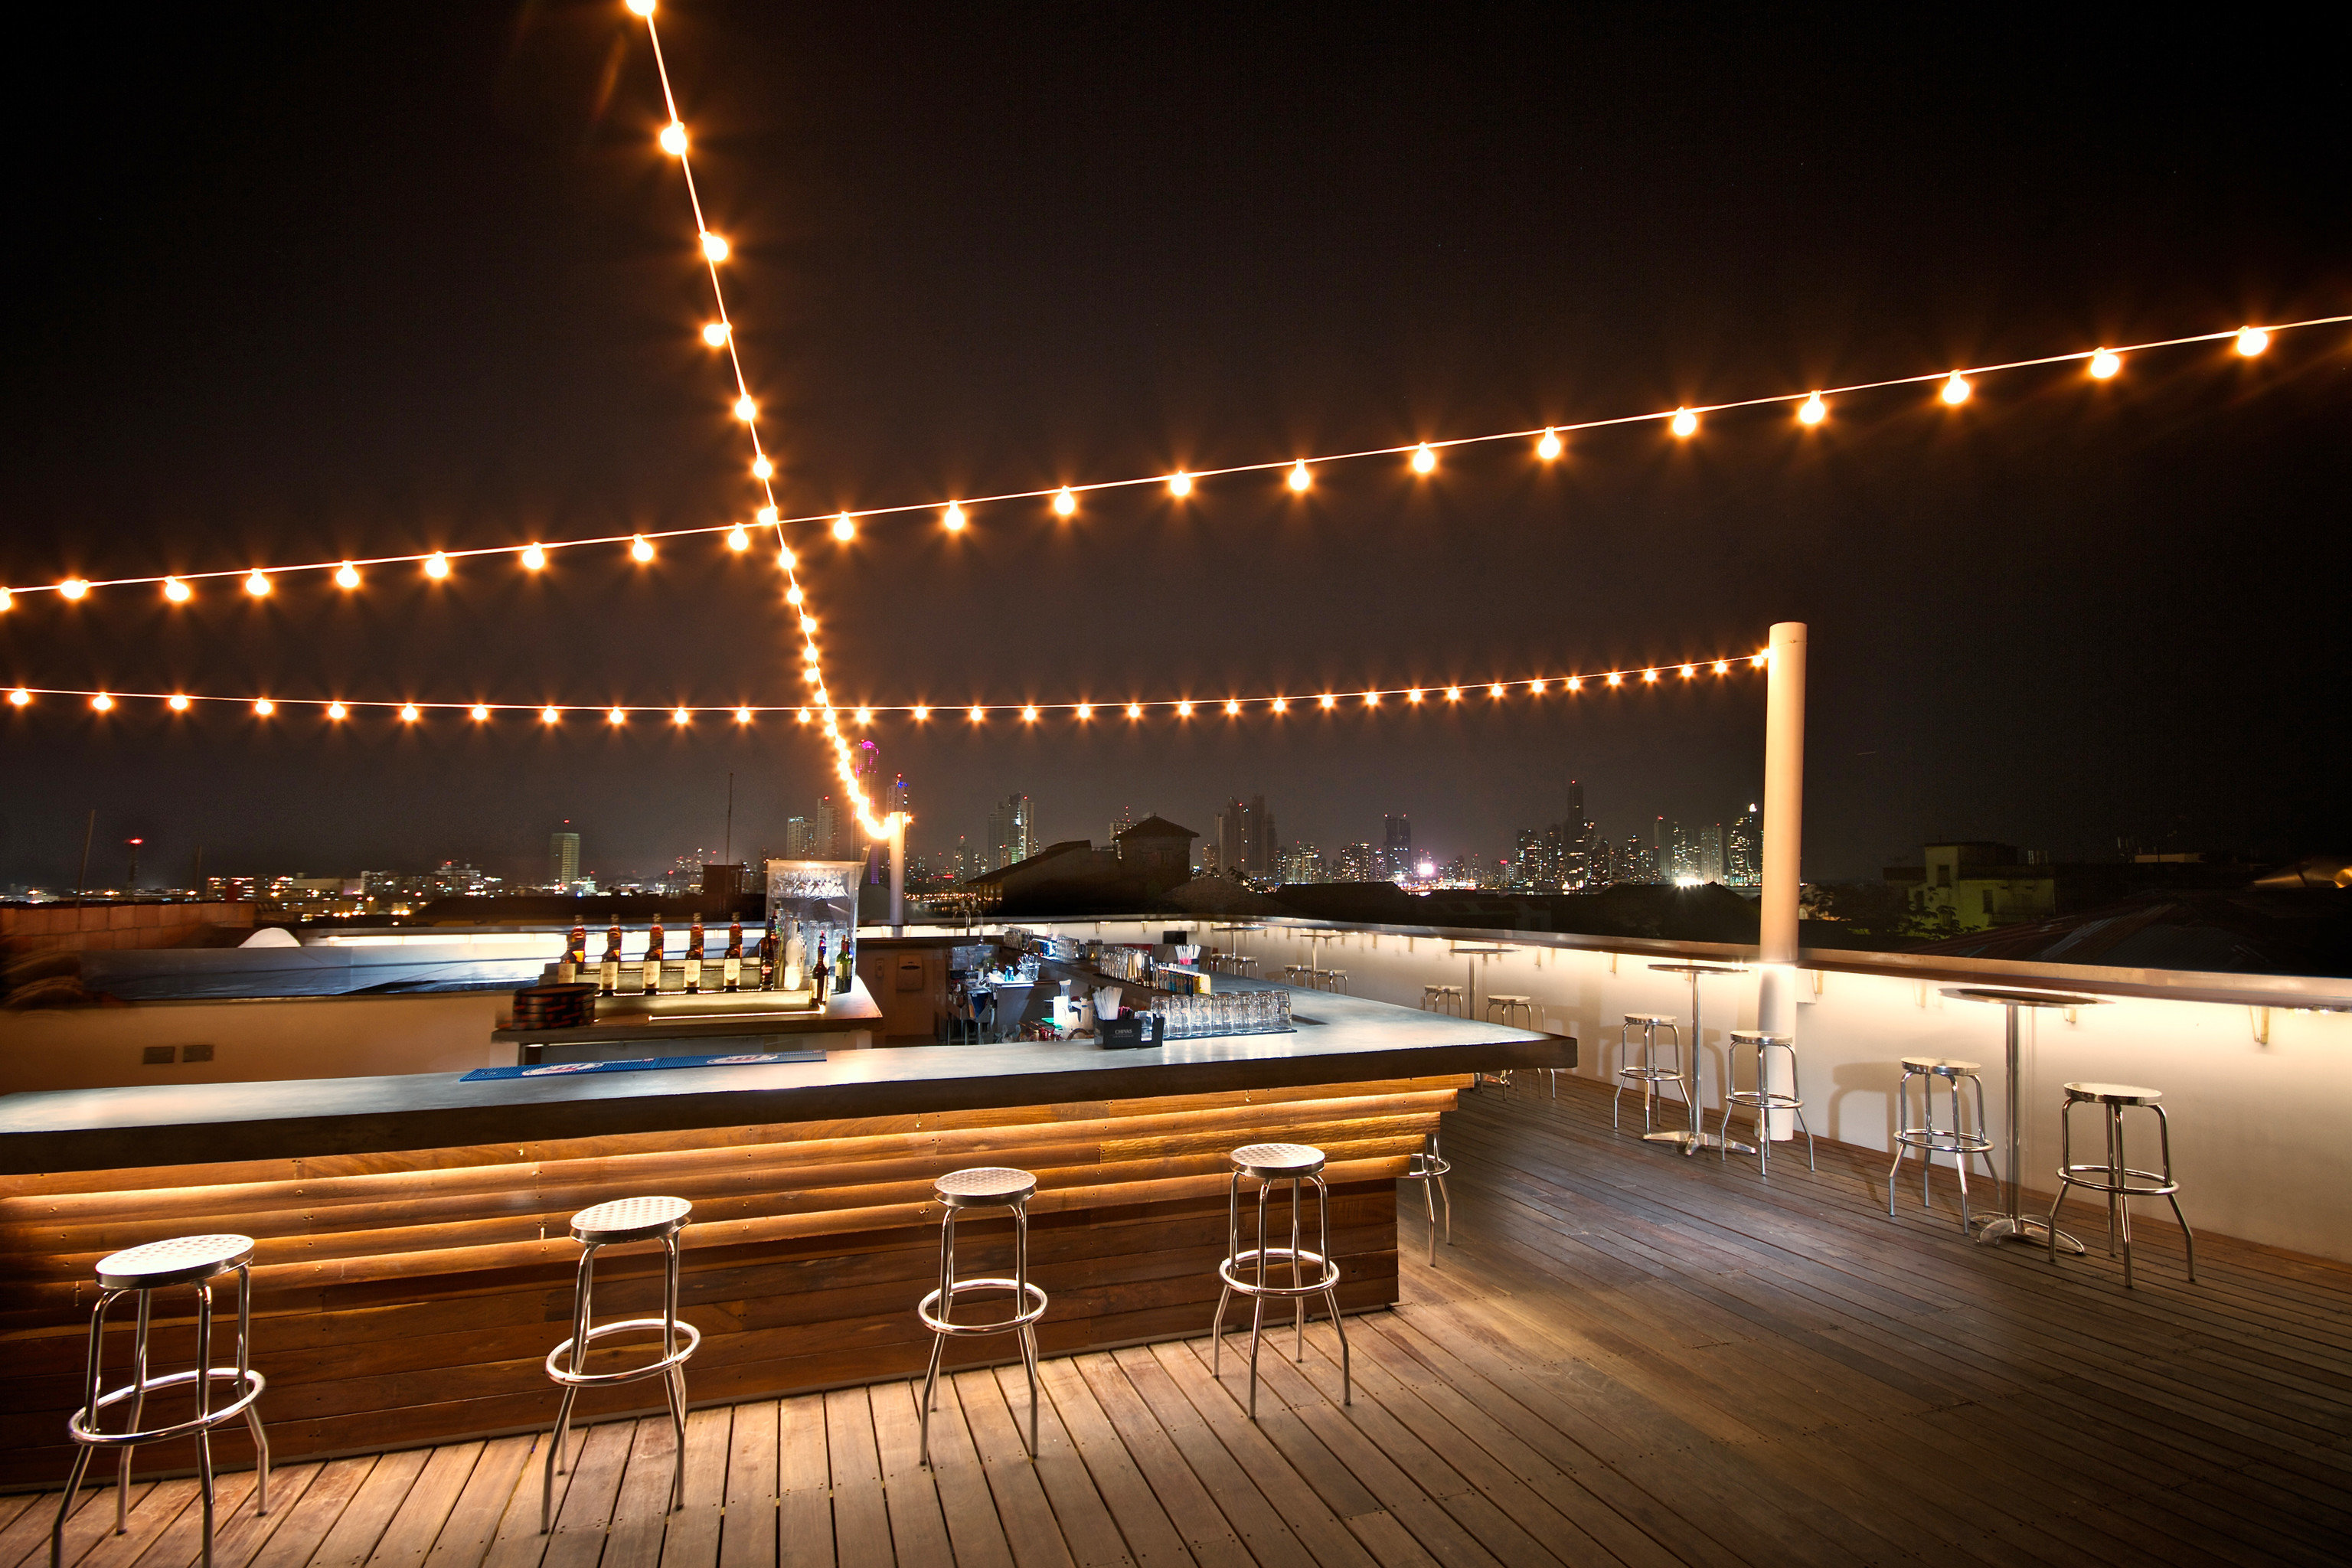 Bar City Drink Eat Rooftop passenger ship night light yacht vehicle Boat lighting luxury yacht ship coming